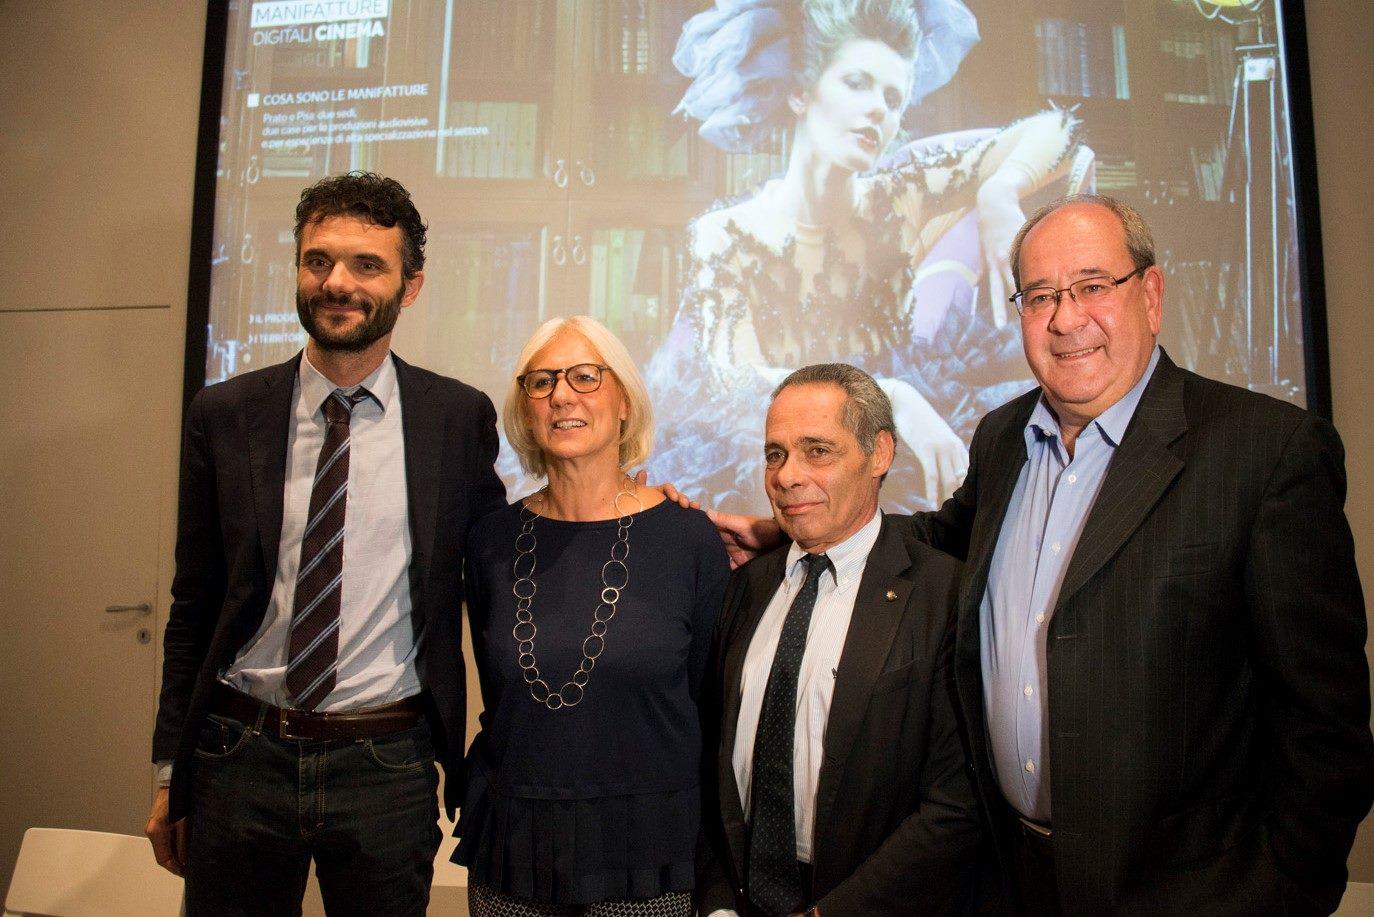 Manifatture Digitali Cinema Prato